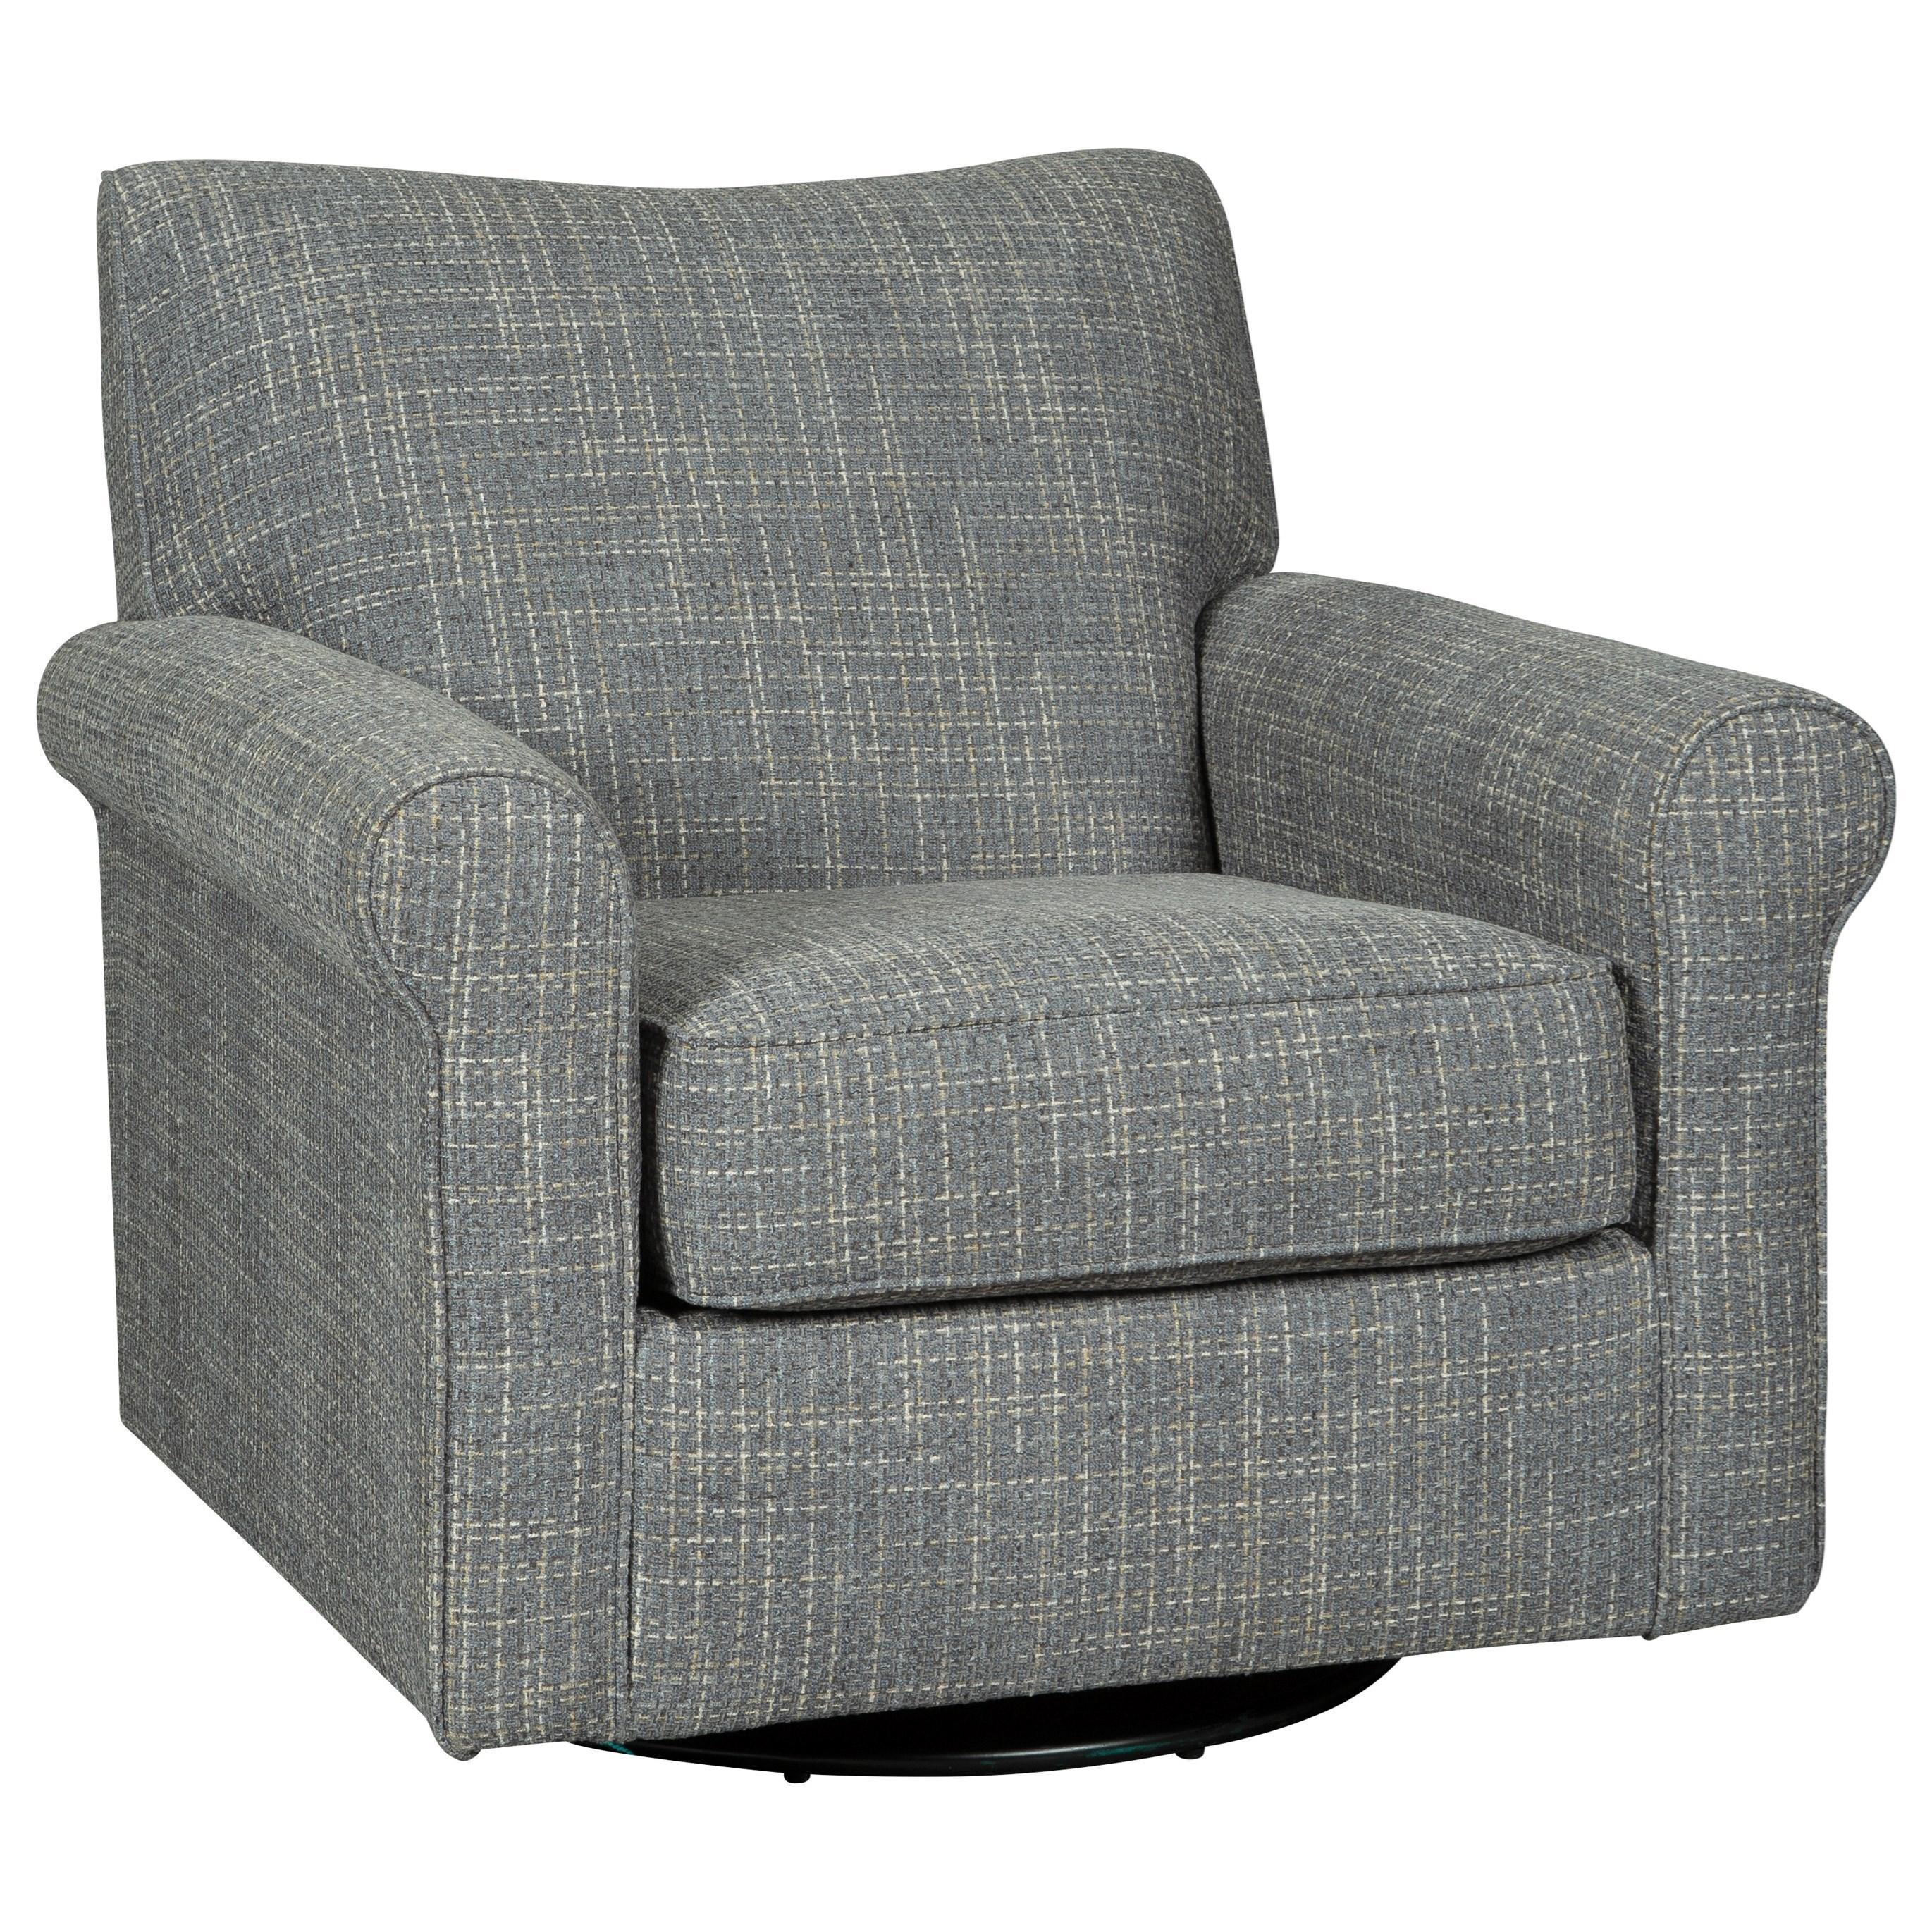 Ashley Signature Design Renley Swivel Glider Accent Chair